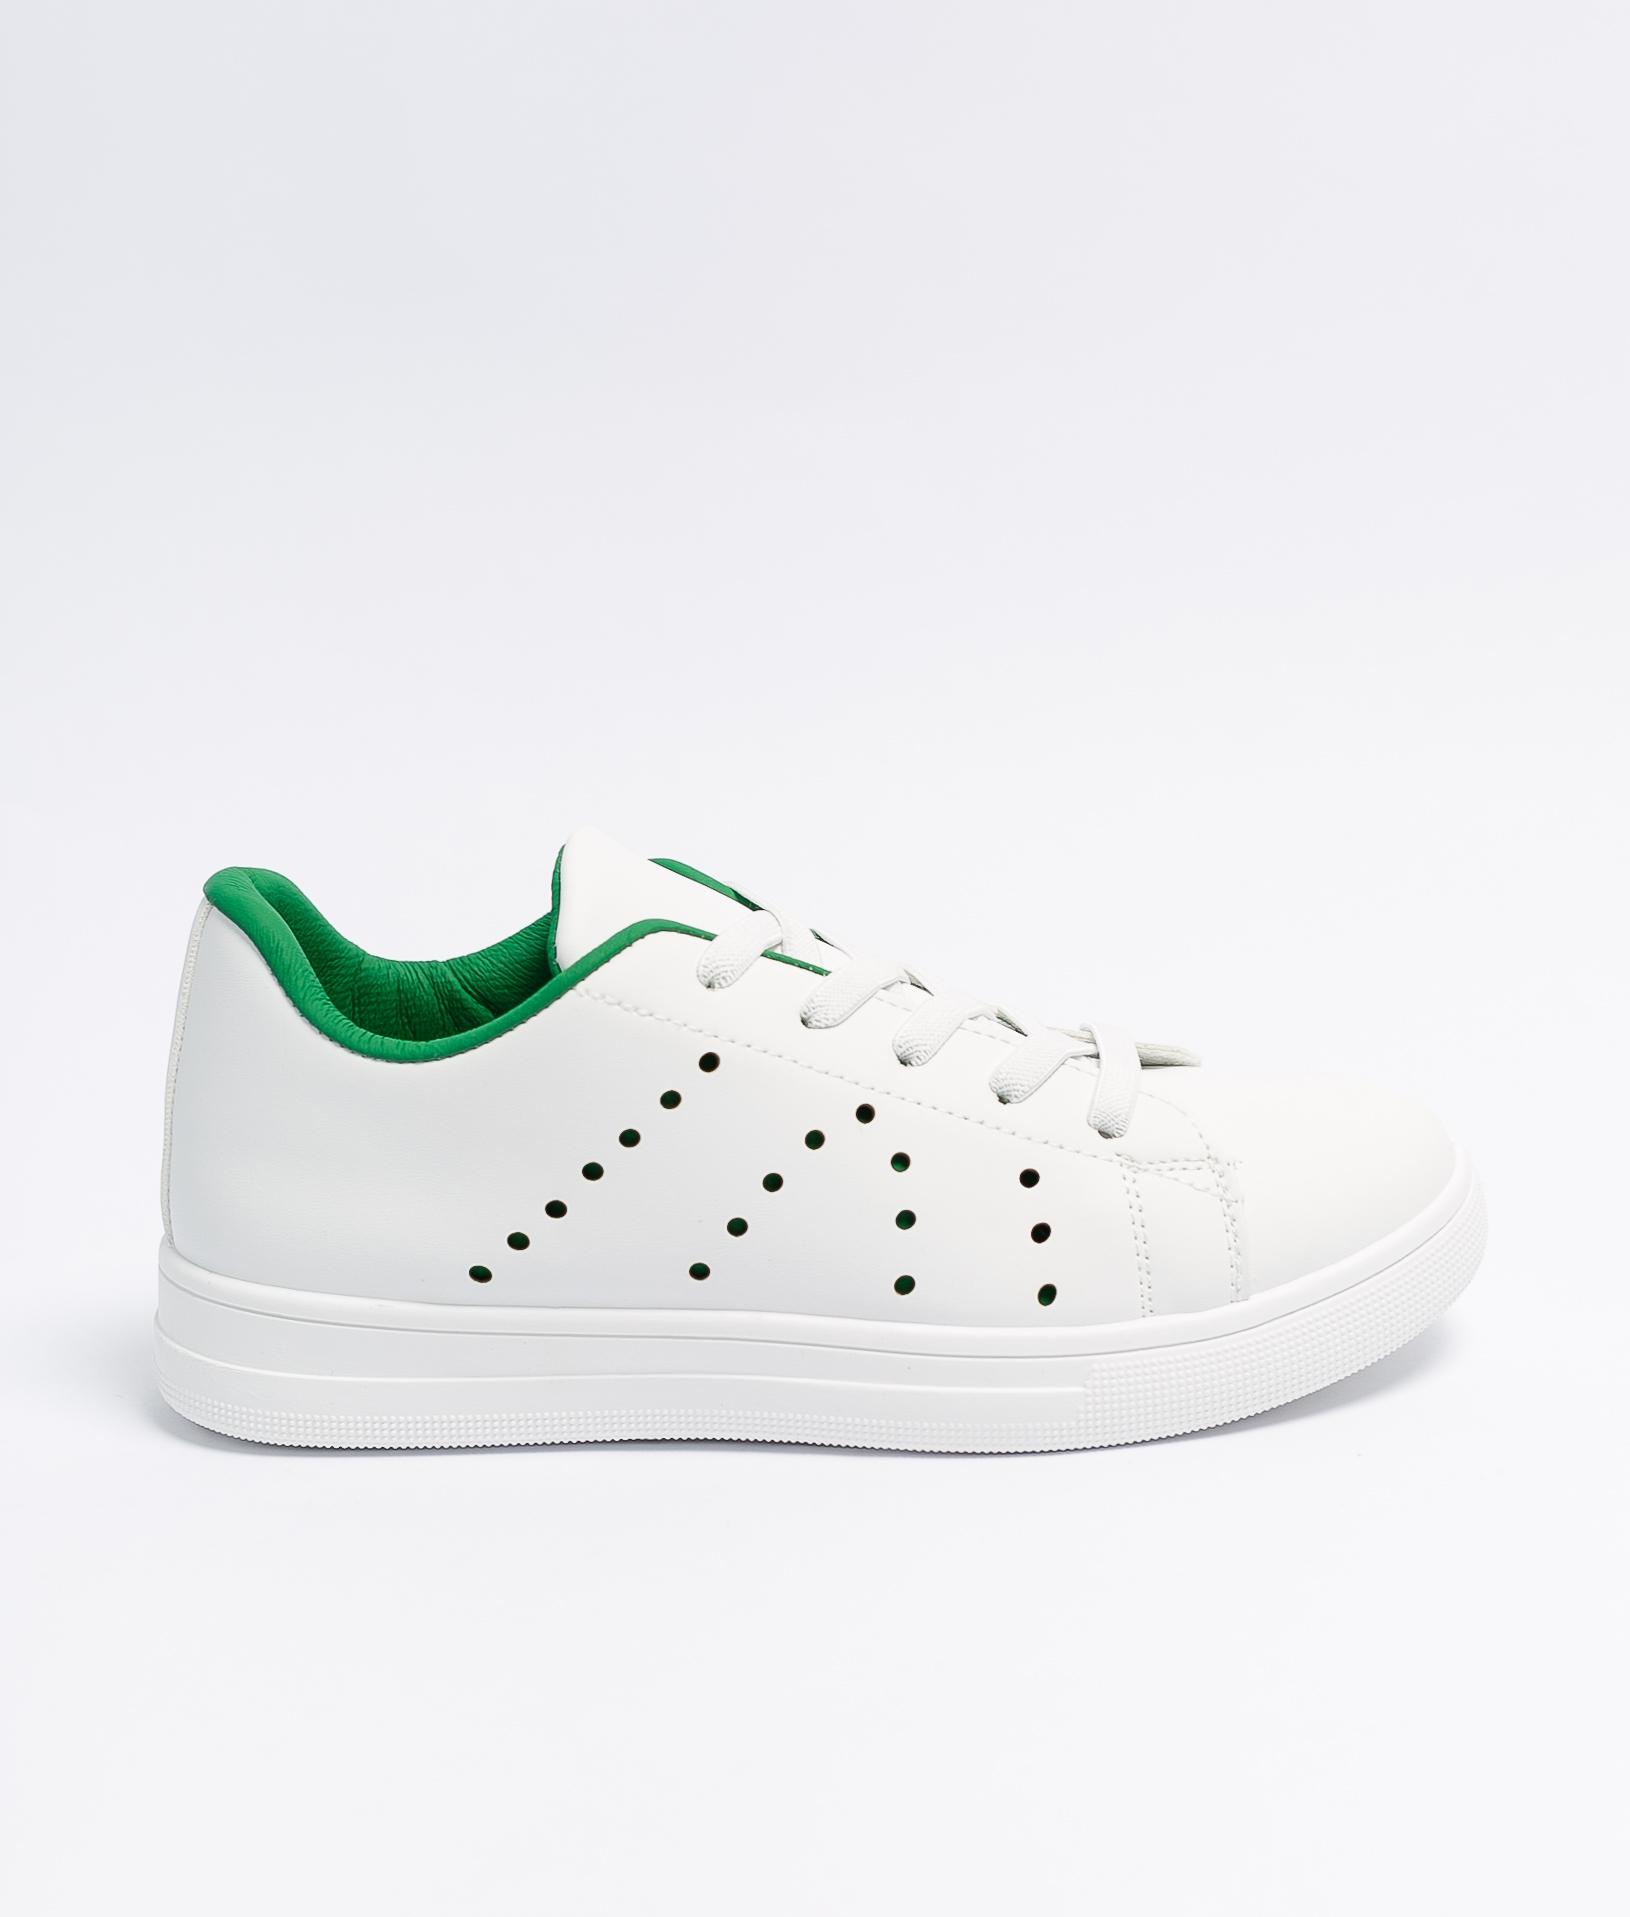 Sneakers Atelier - Verde